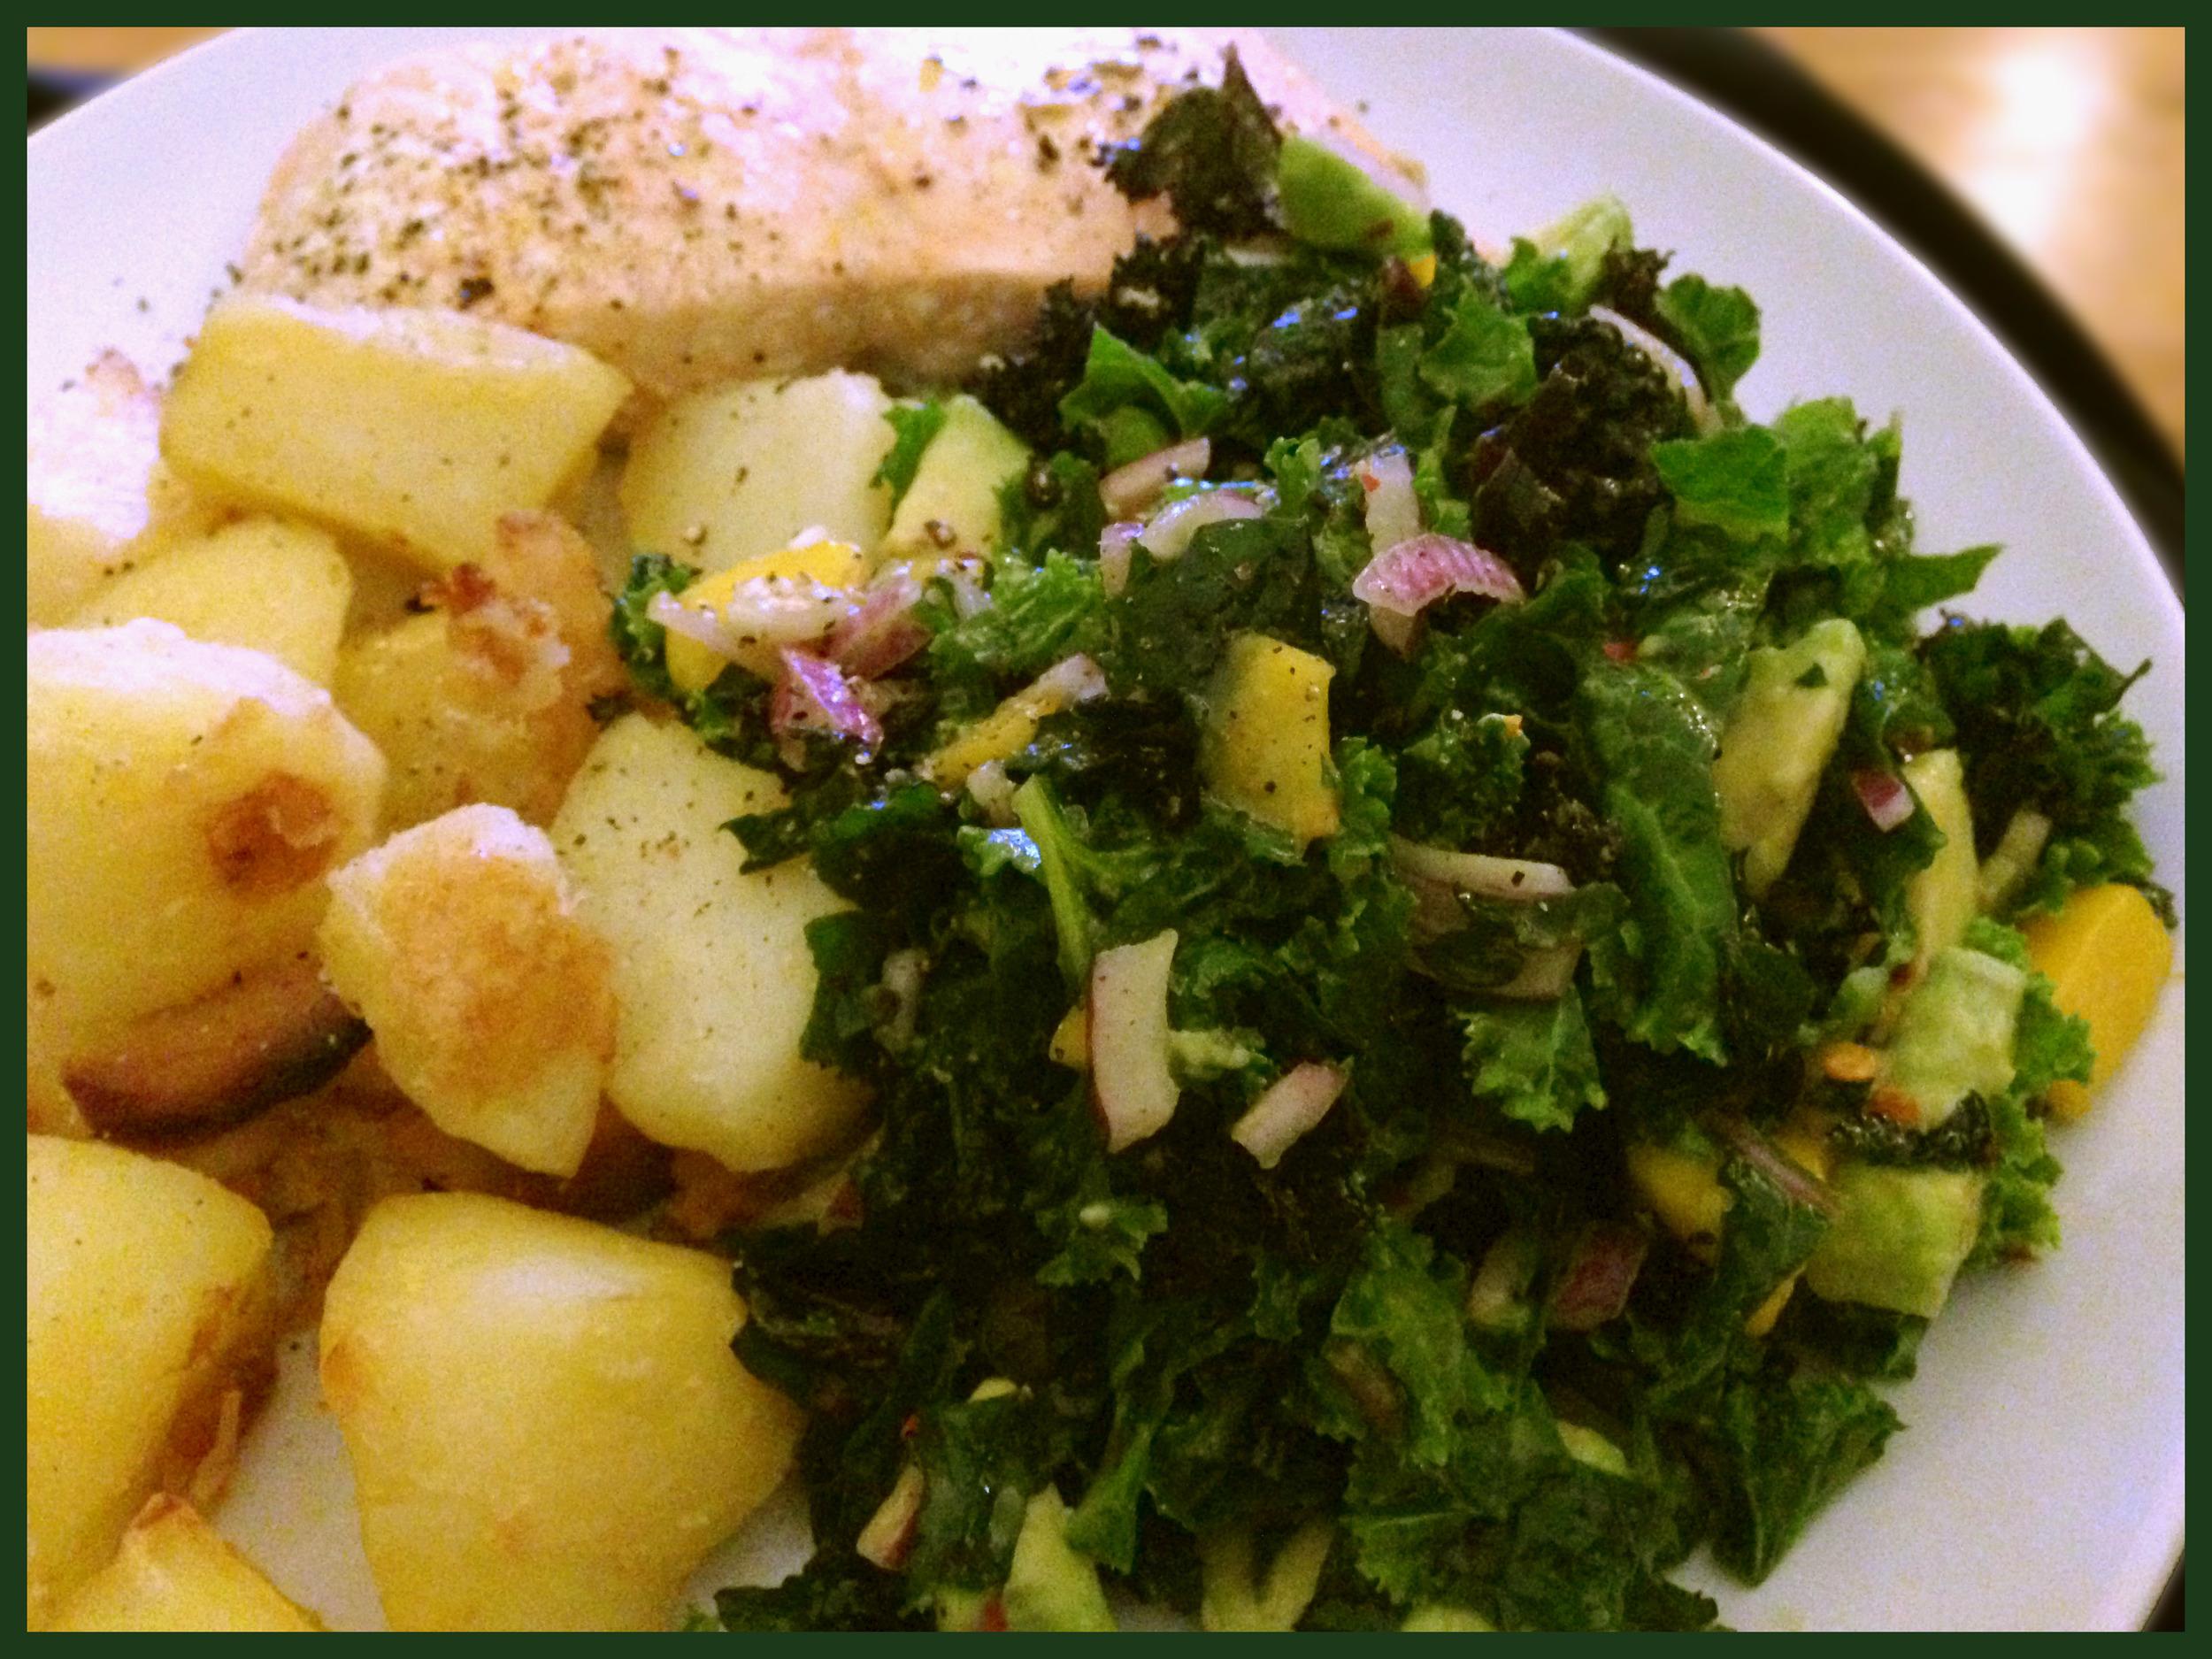 Kale, Avocado and Mango superfood salad with roast potatoes, roast garlic and grilled salmon. Boom!